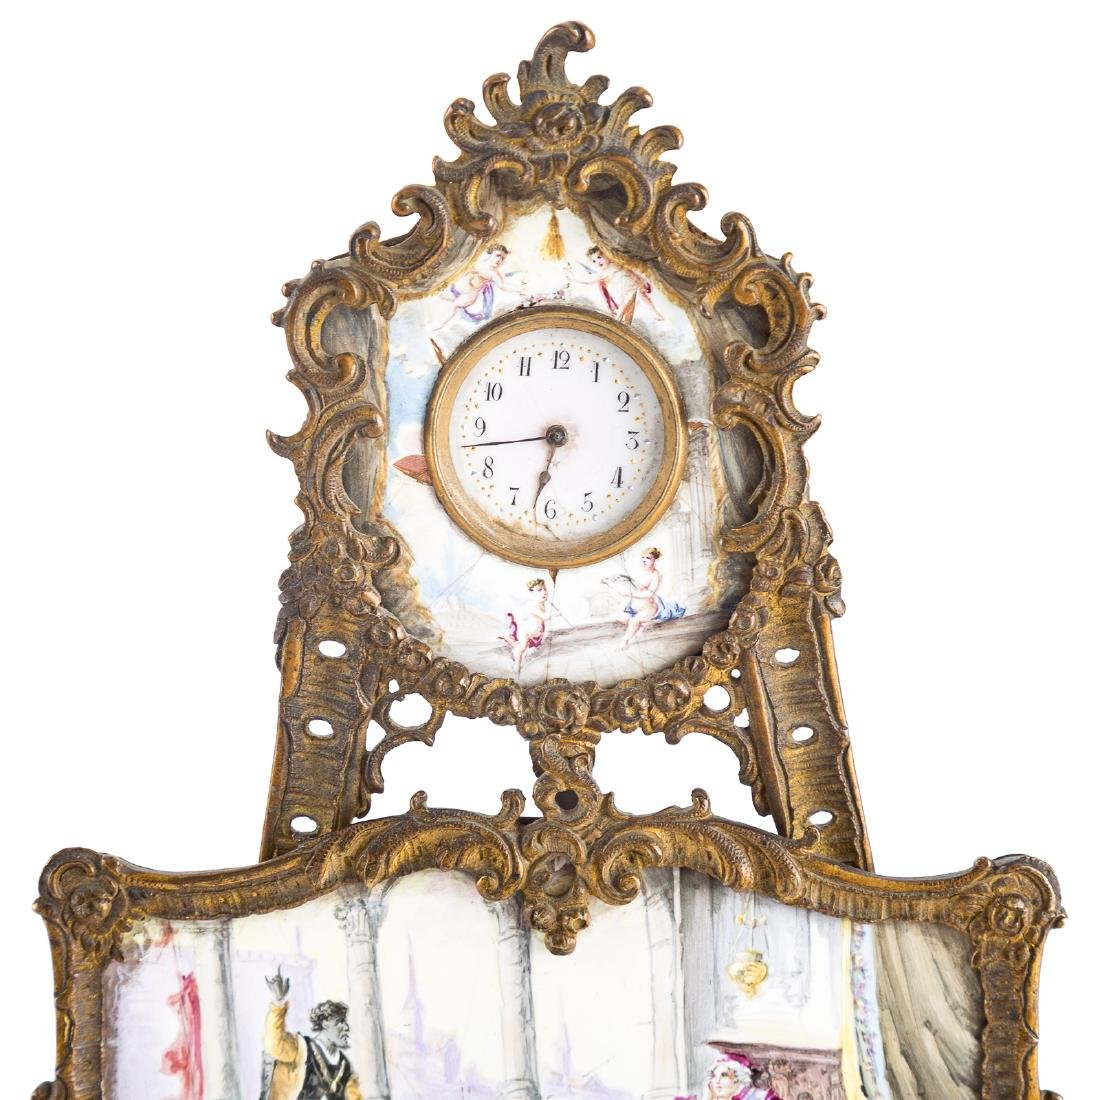 Rococo style gilt-metal desk clock - 2